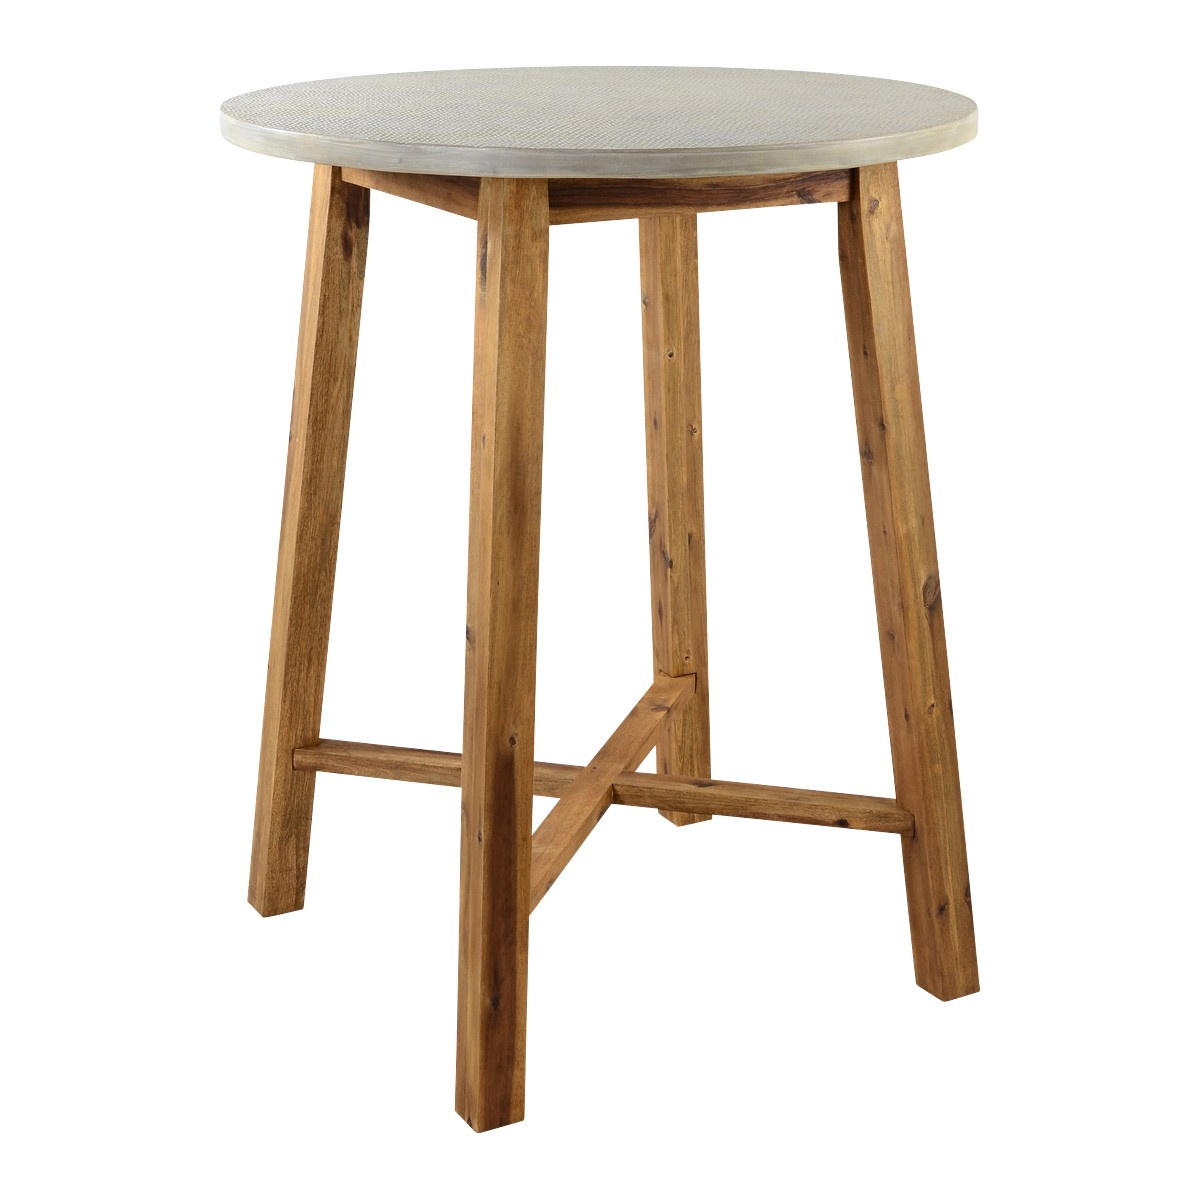 Aria Cement & Acacia Indoor / Outdoor Round Bar Table, 90cm